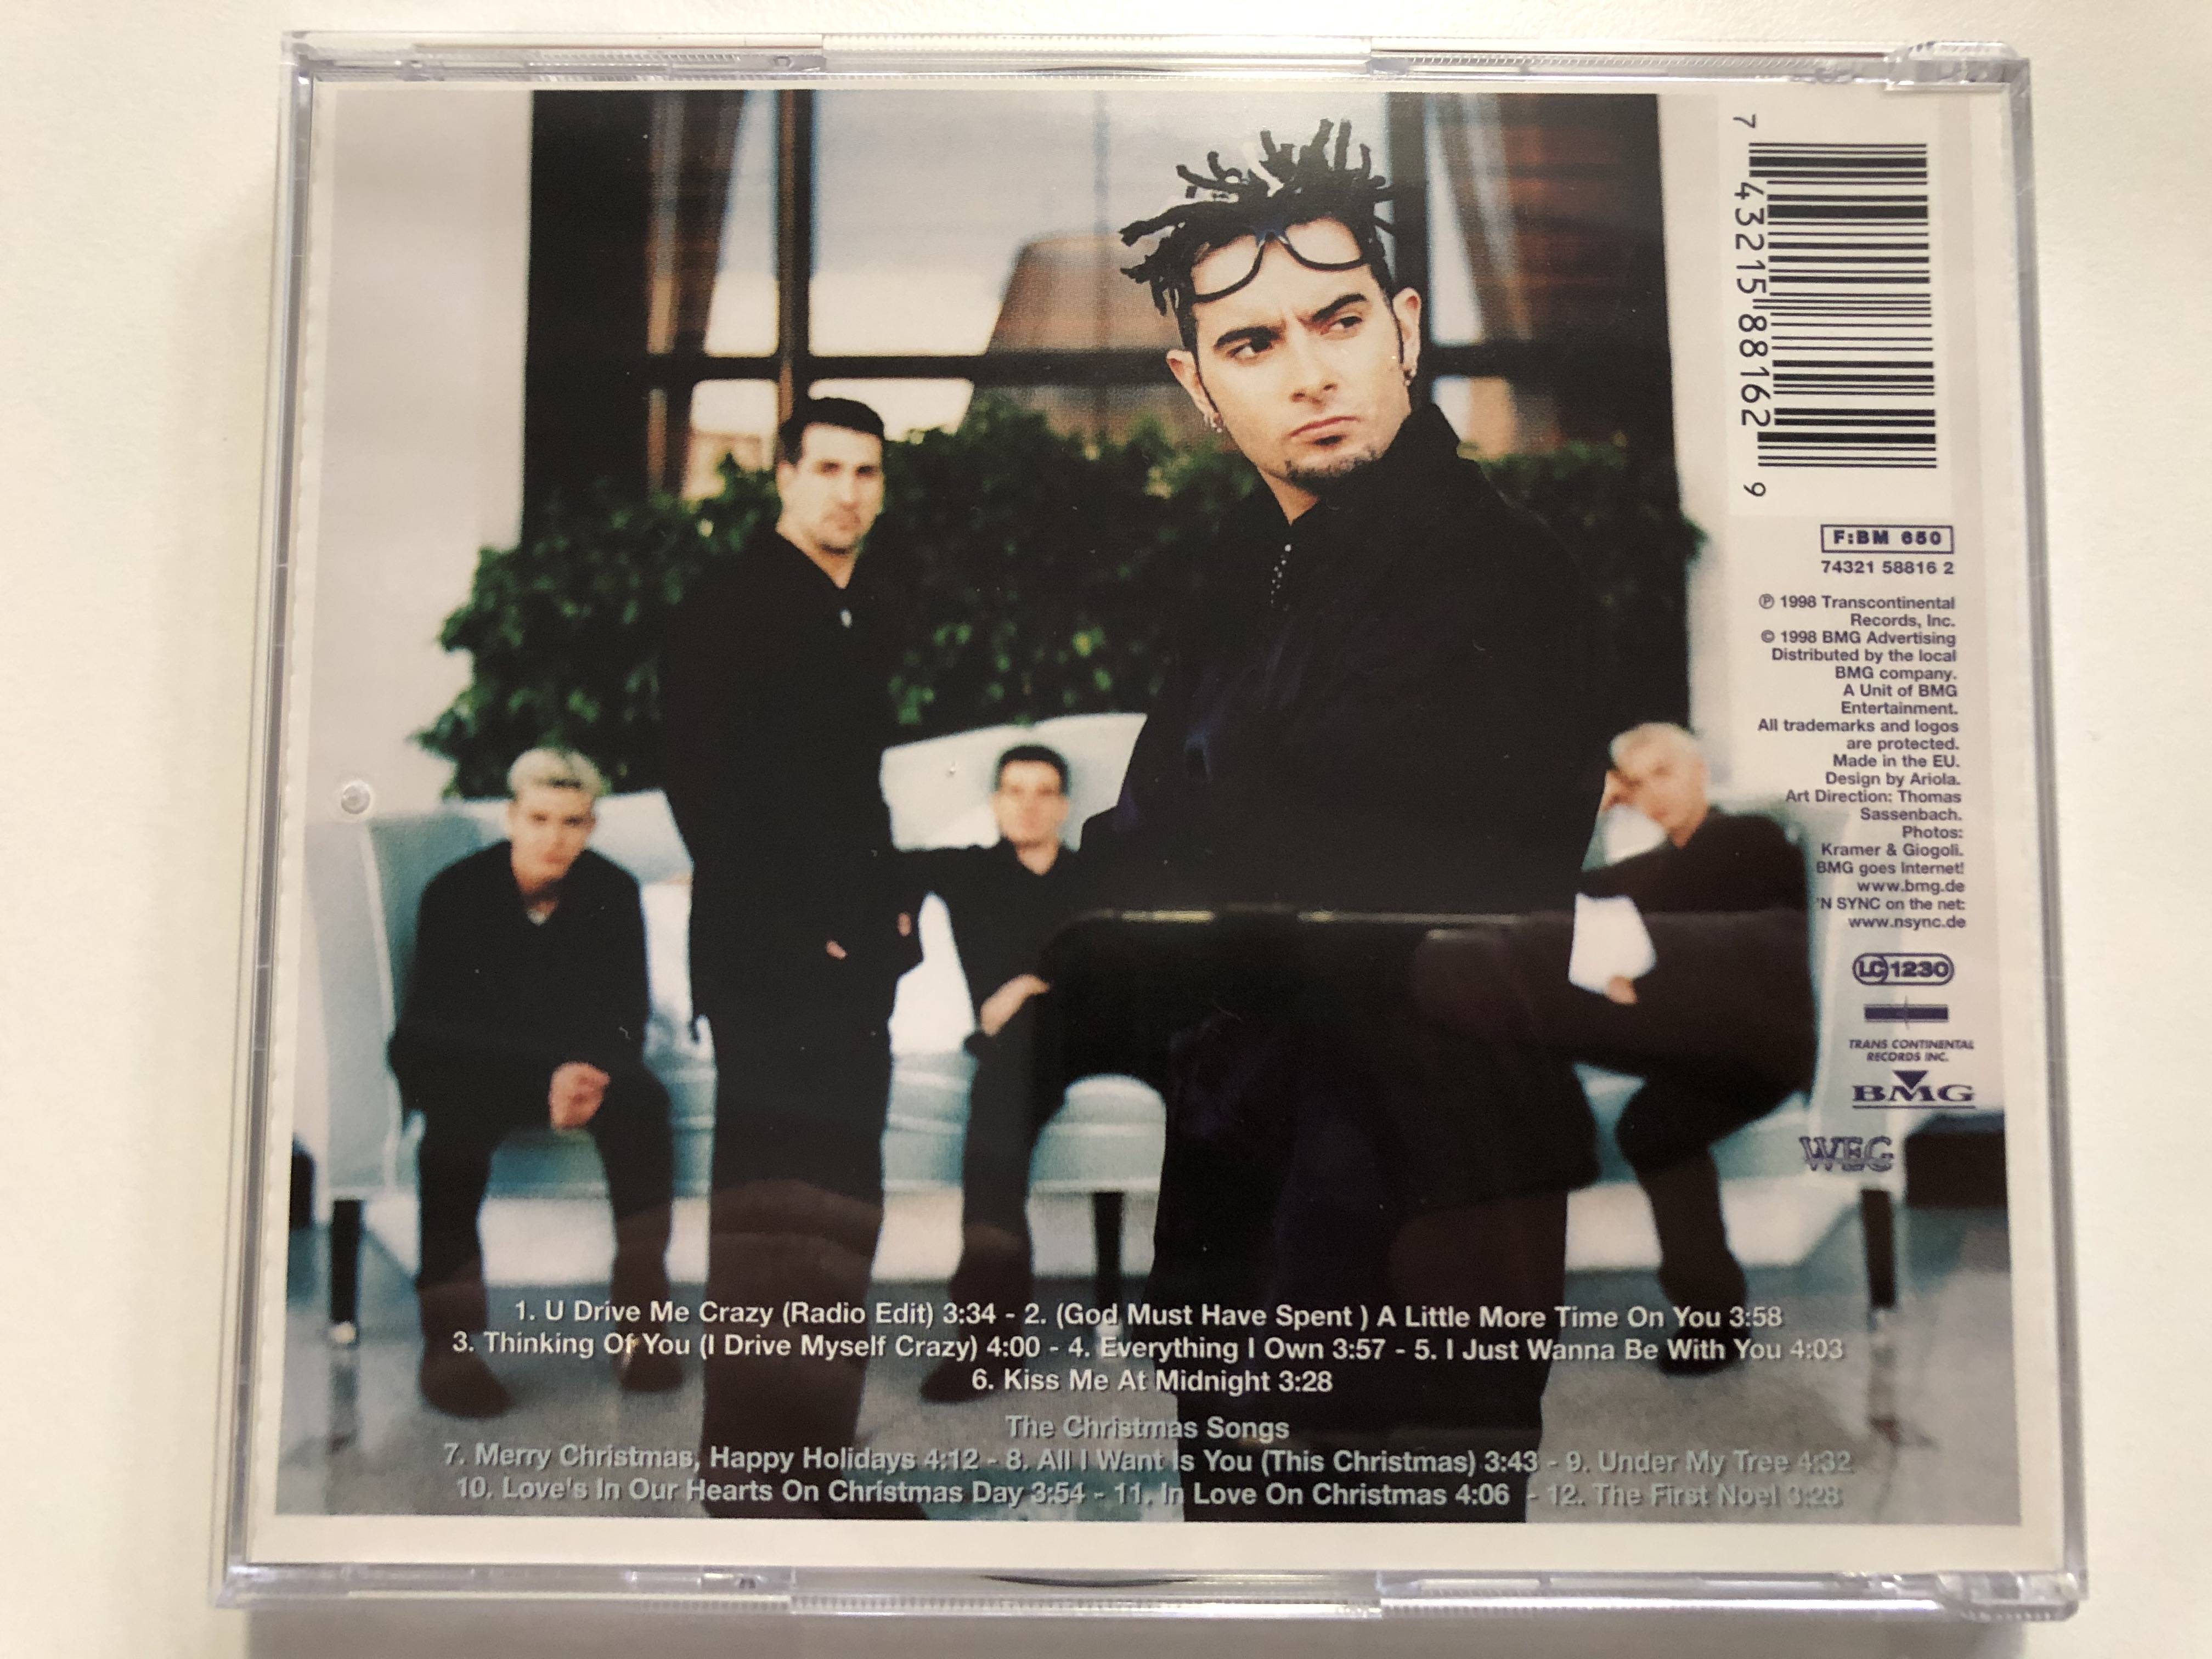 nsync-the-winter-album-bmg-audio-cd-1998-74321-58816-2-2-.jpg